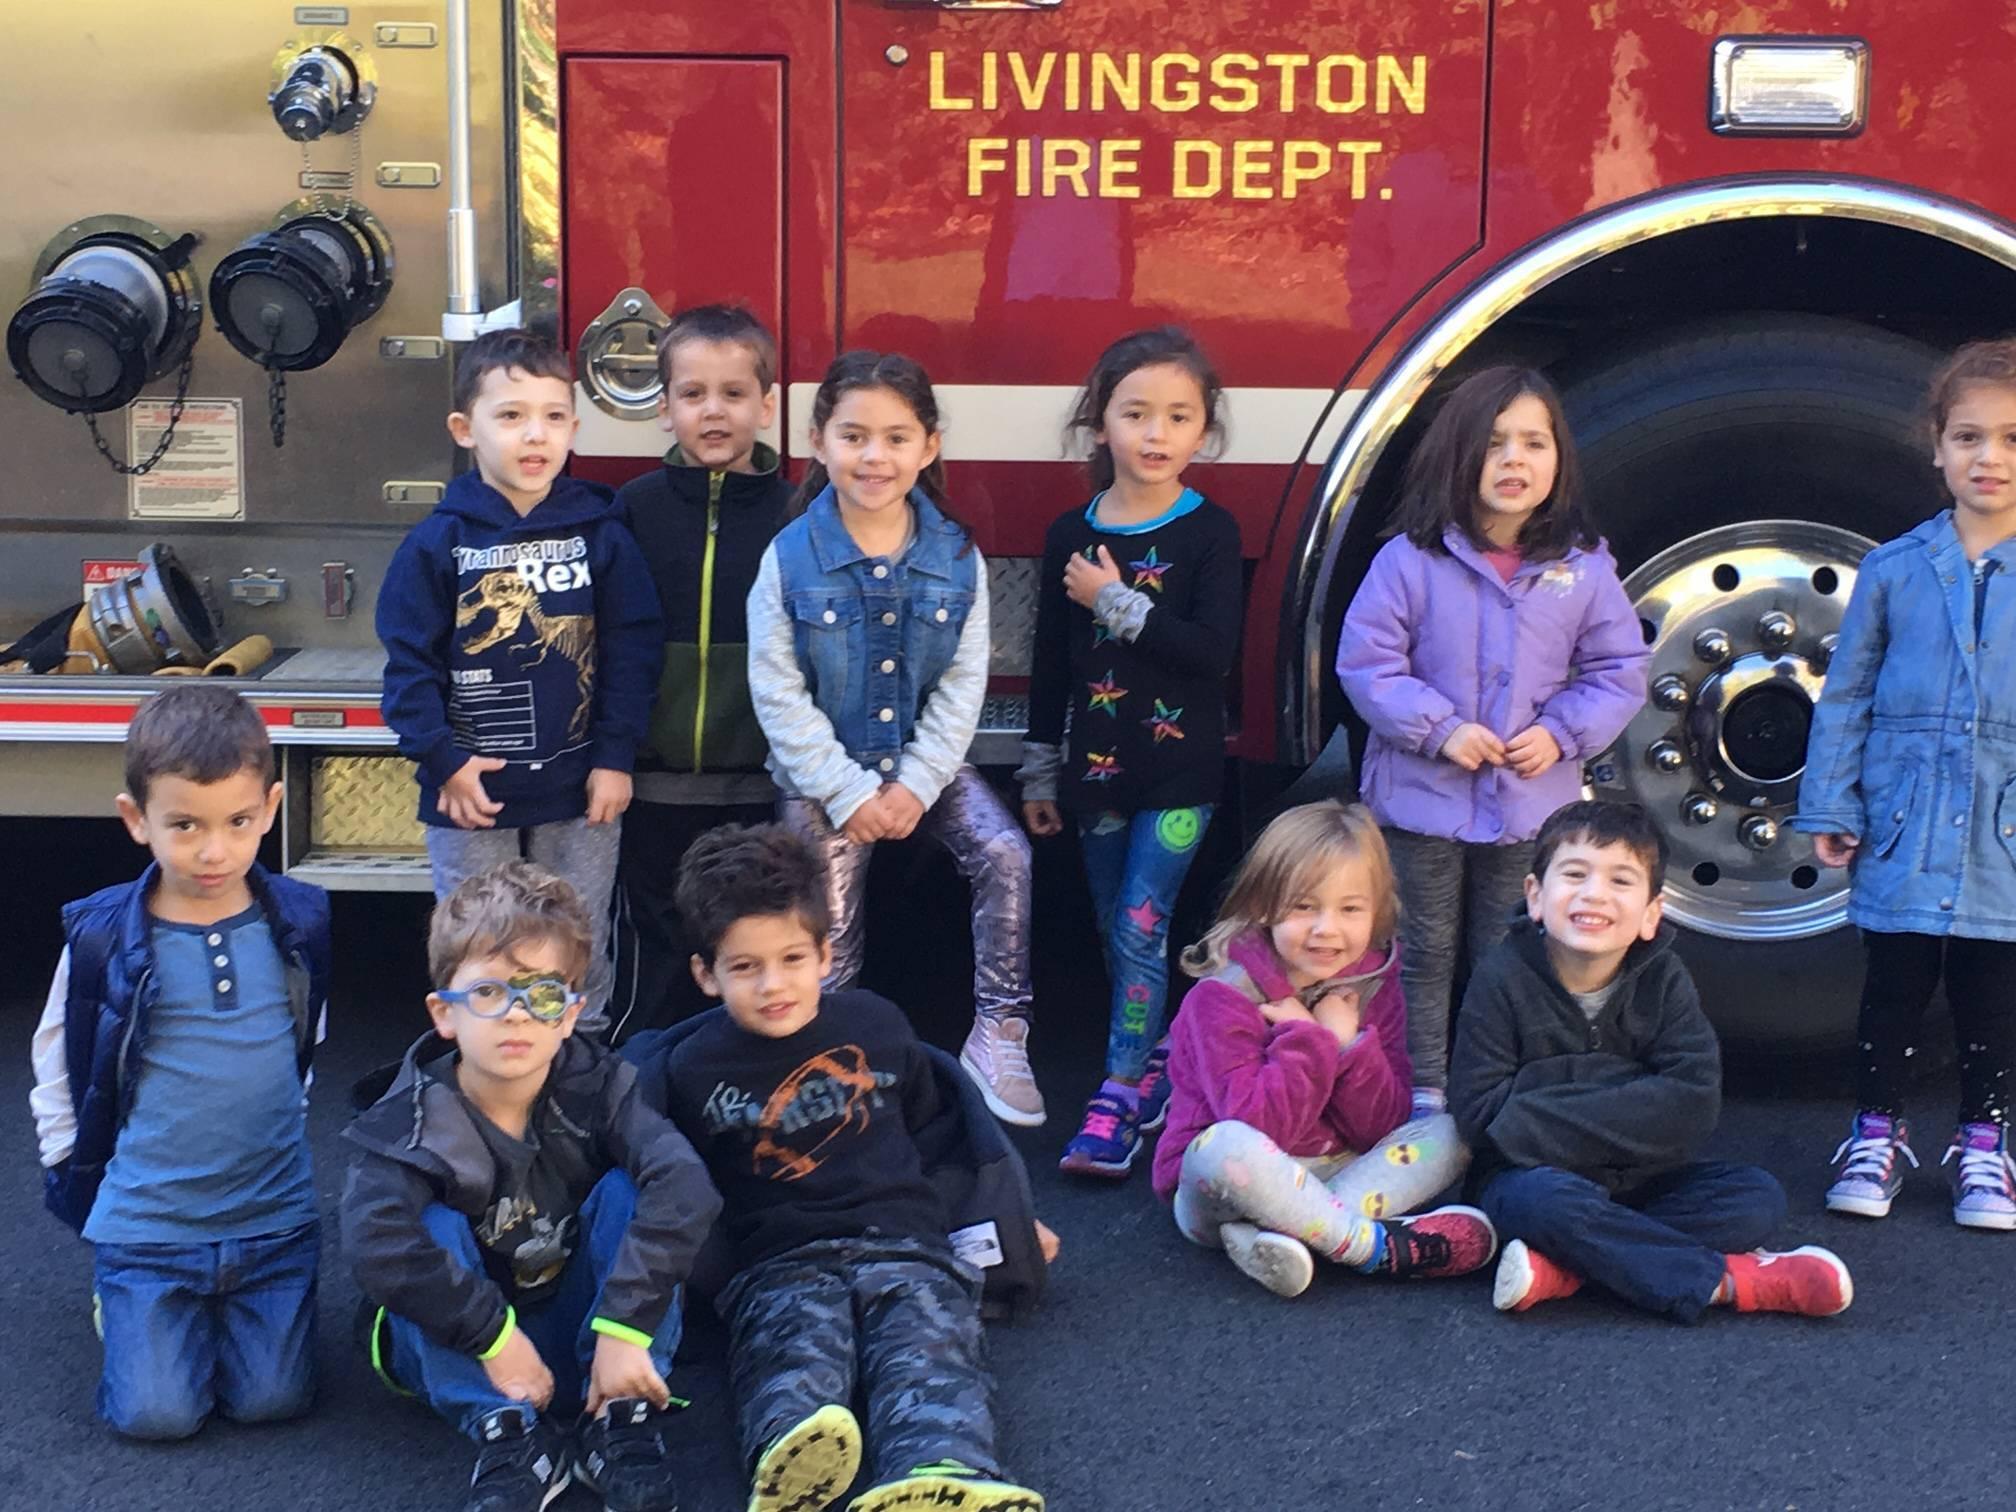 d6ceeda23decf0956195_Livingston_Fire_Department_visits_the_Early_School__12_.JPG